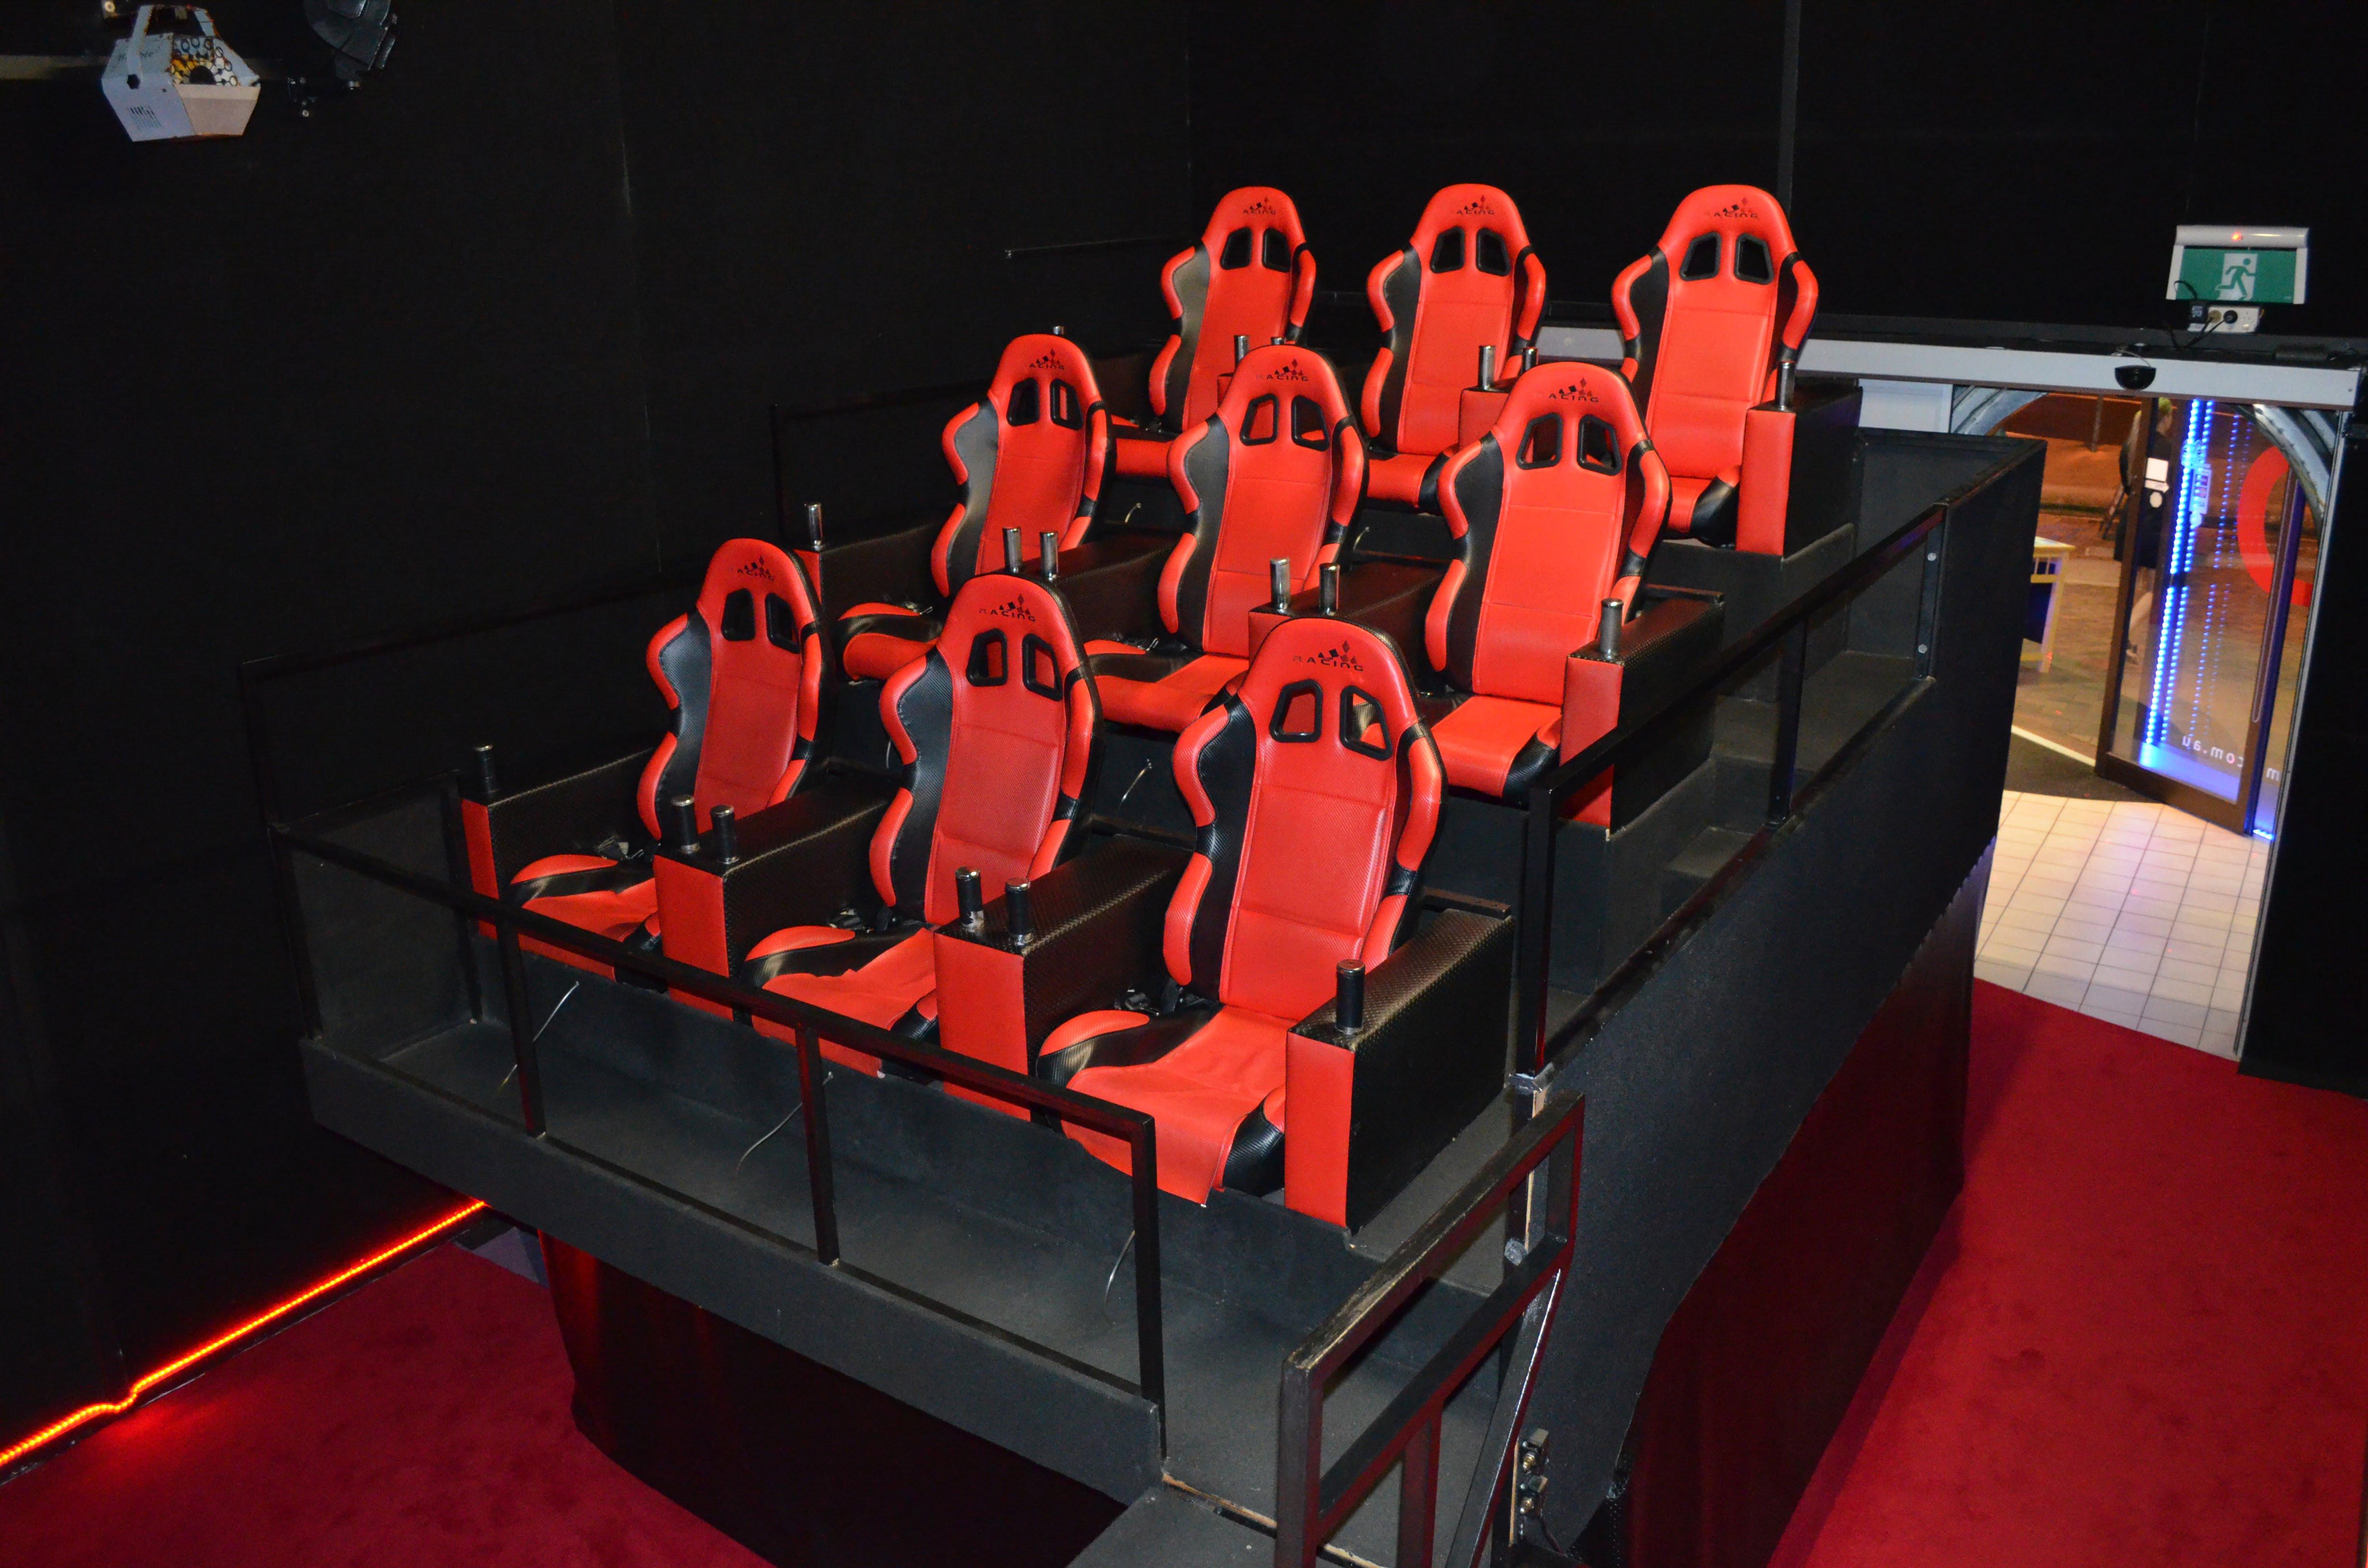 7d cinema deals